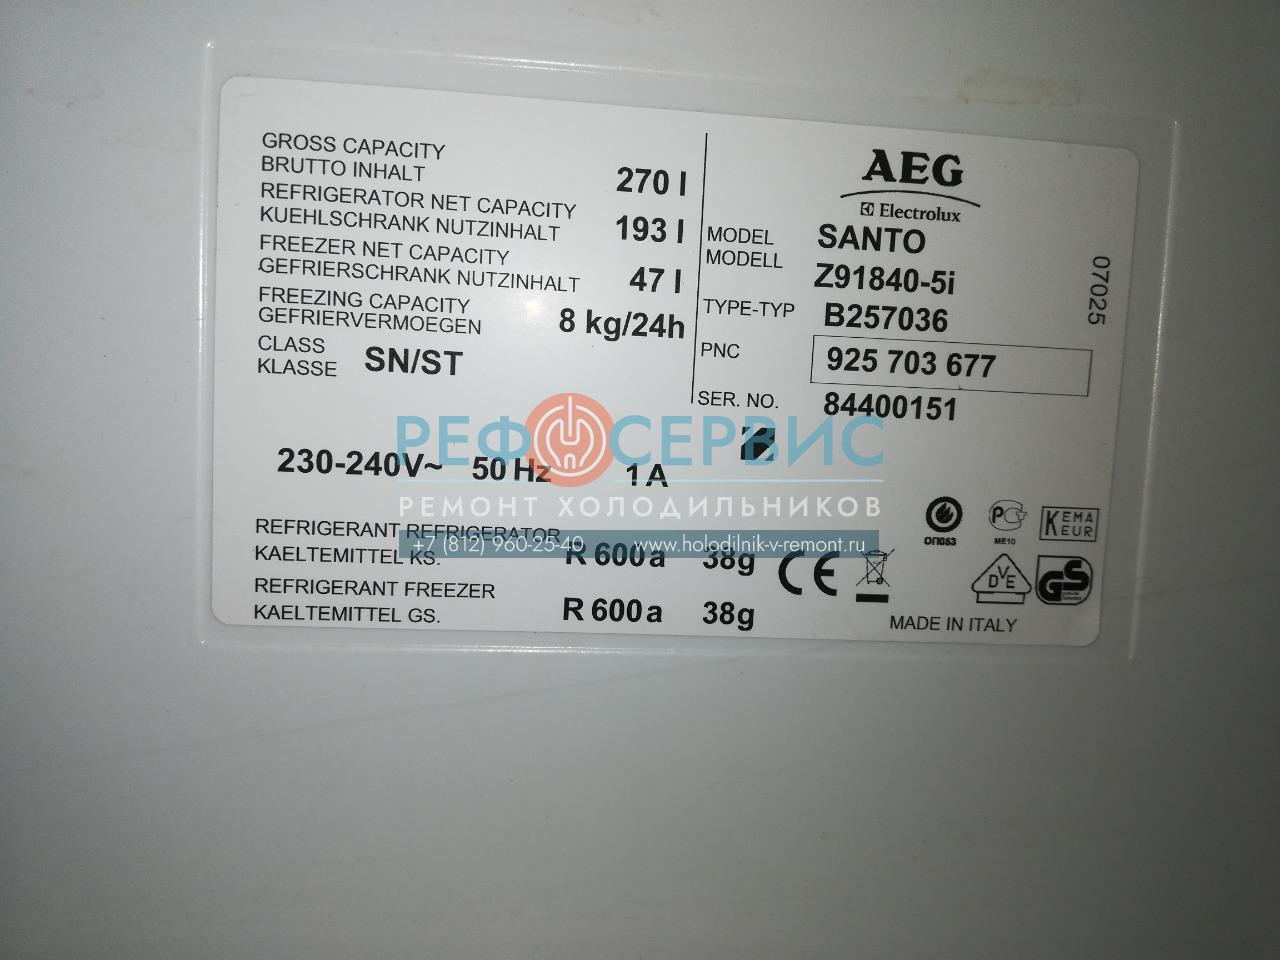 Ремонт холодильника AEG SANTO Z91840-5i